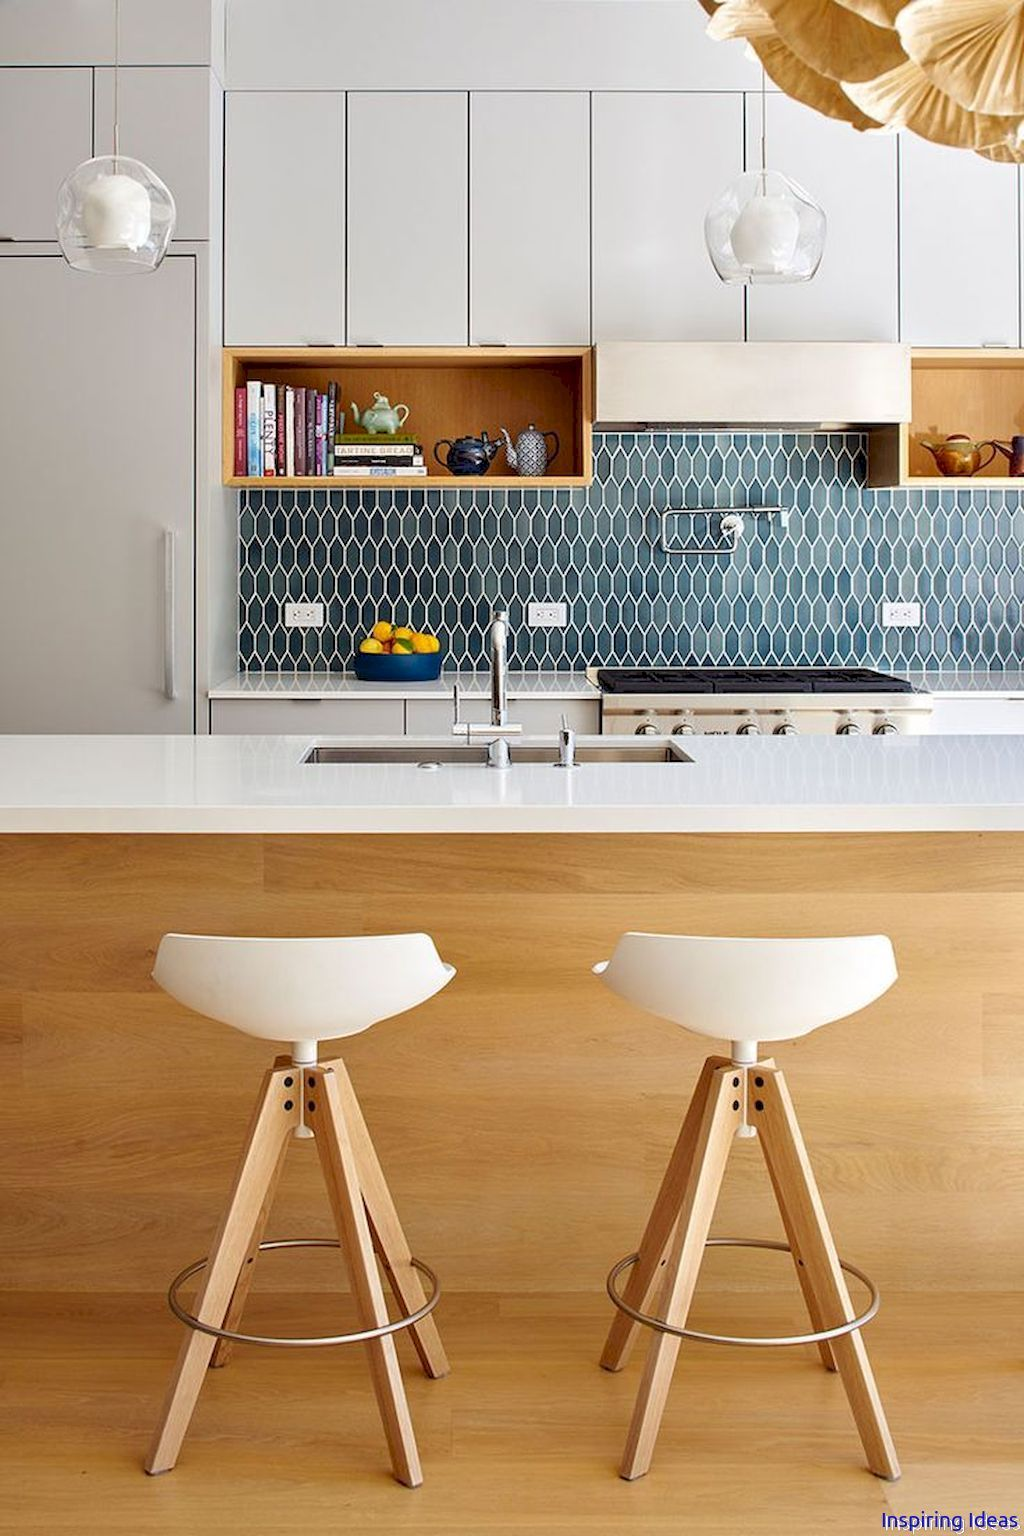 017 Stunning Midcentury Modern Kitchen Backsplash Design Ideas